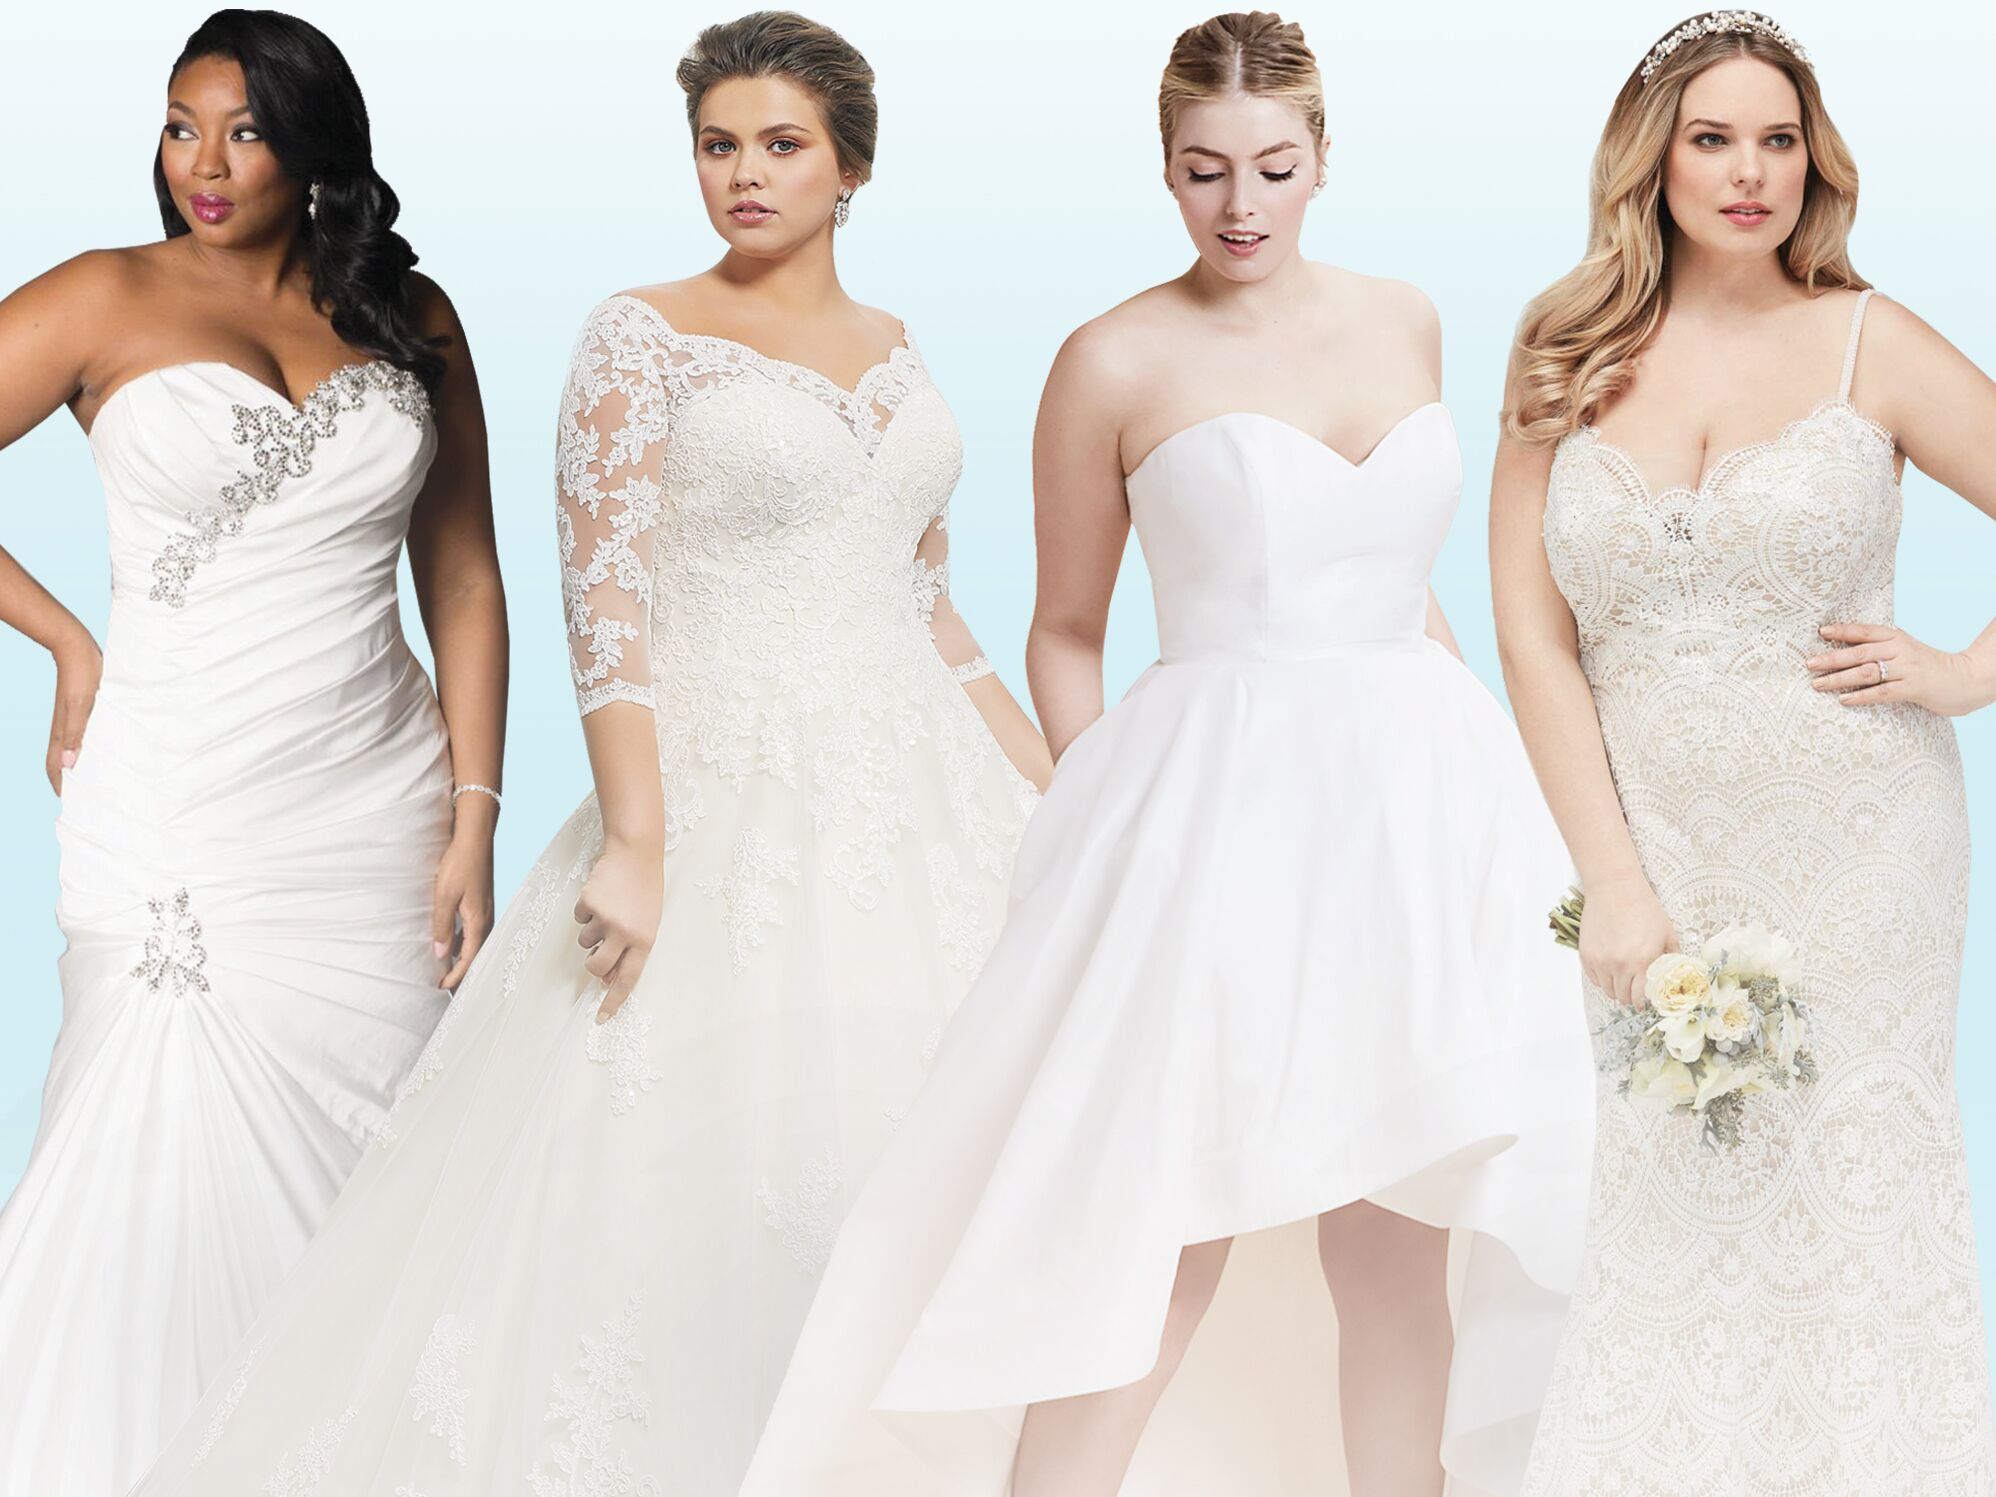 20 Gorgeous Plus Size Wedding Dress You Ll Love,Pencil Wedding Dresses Uk